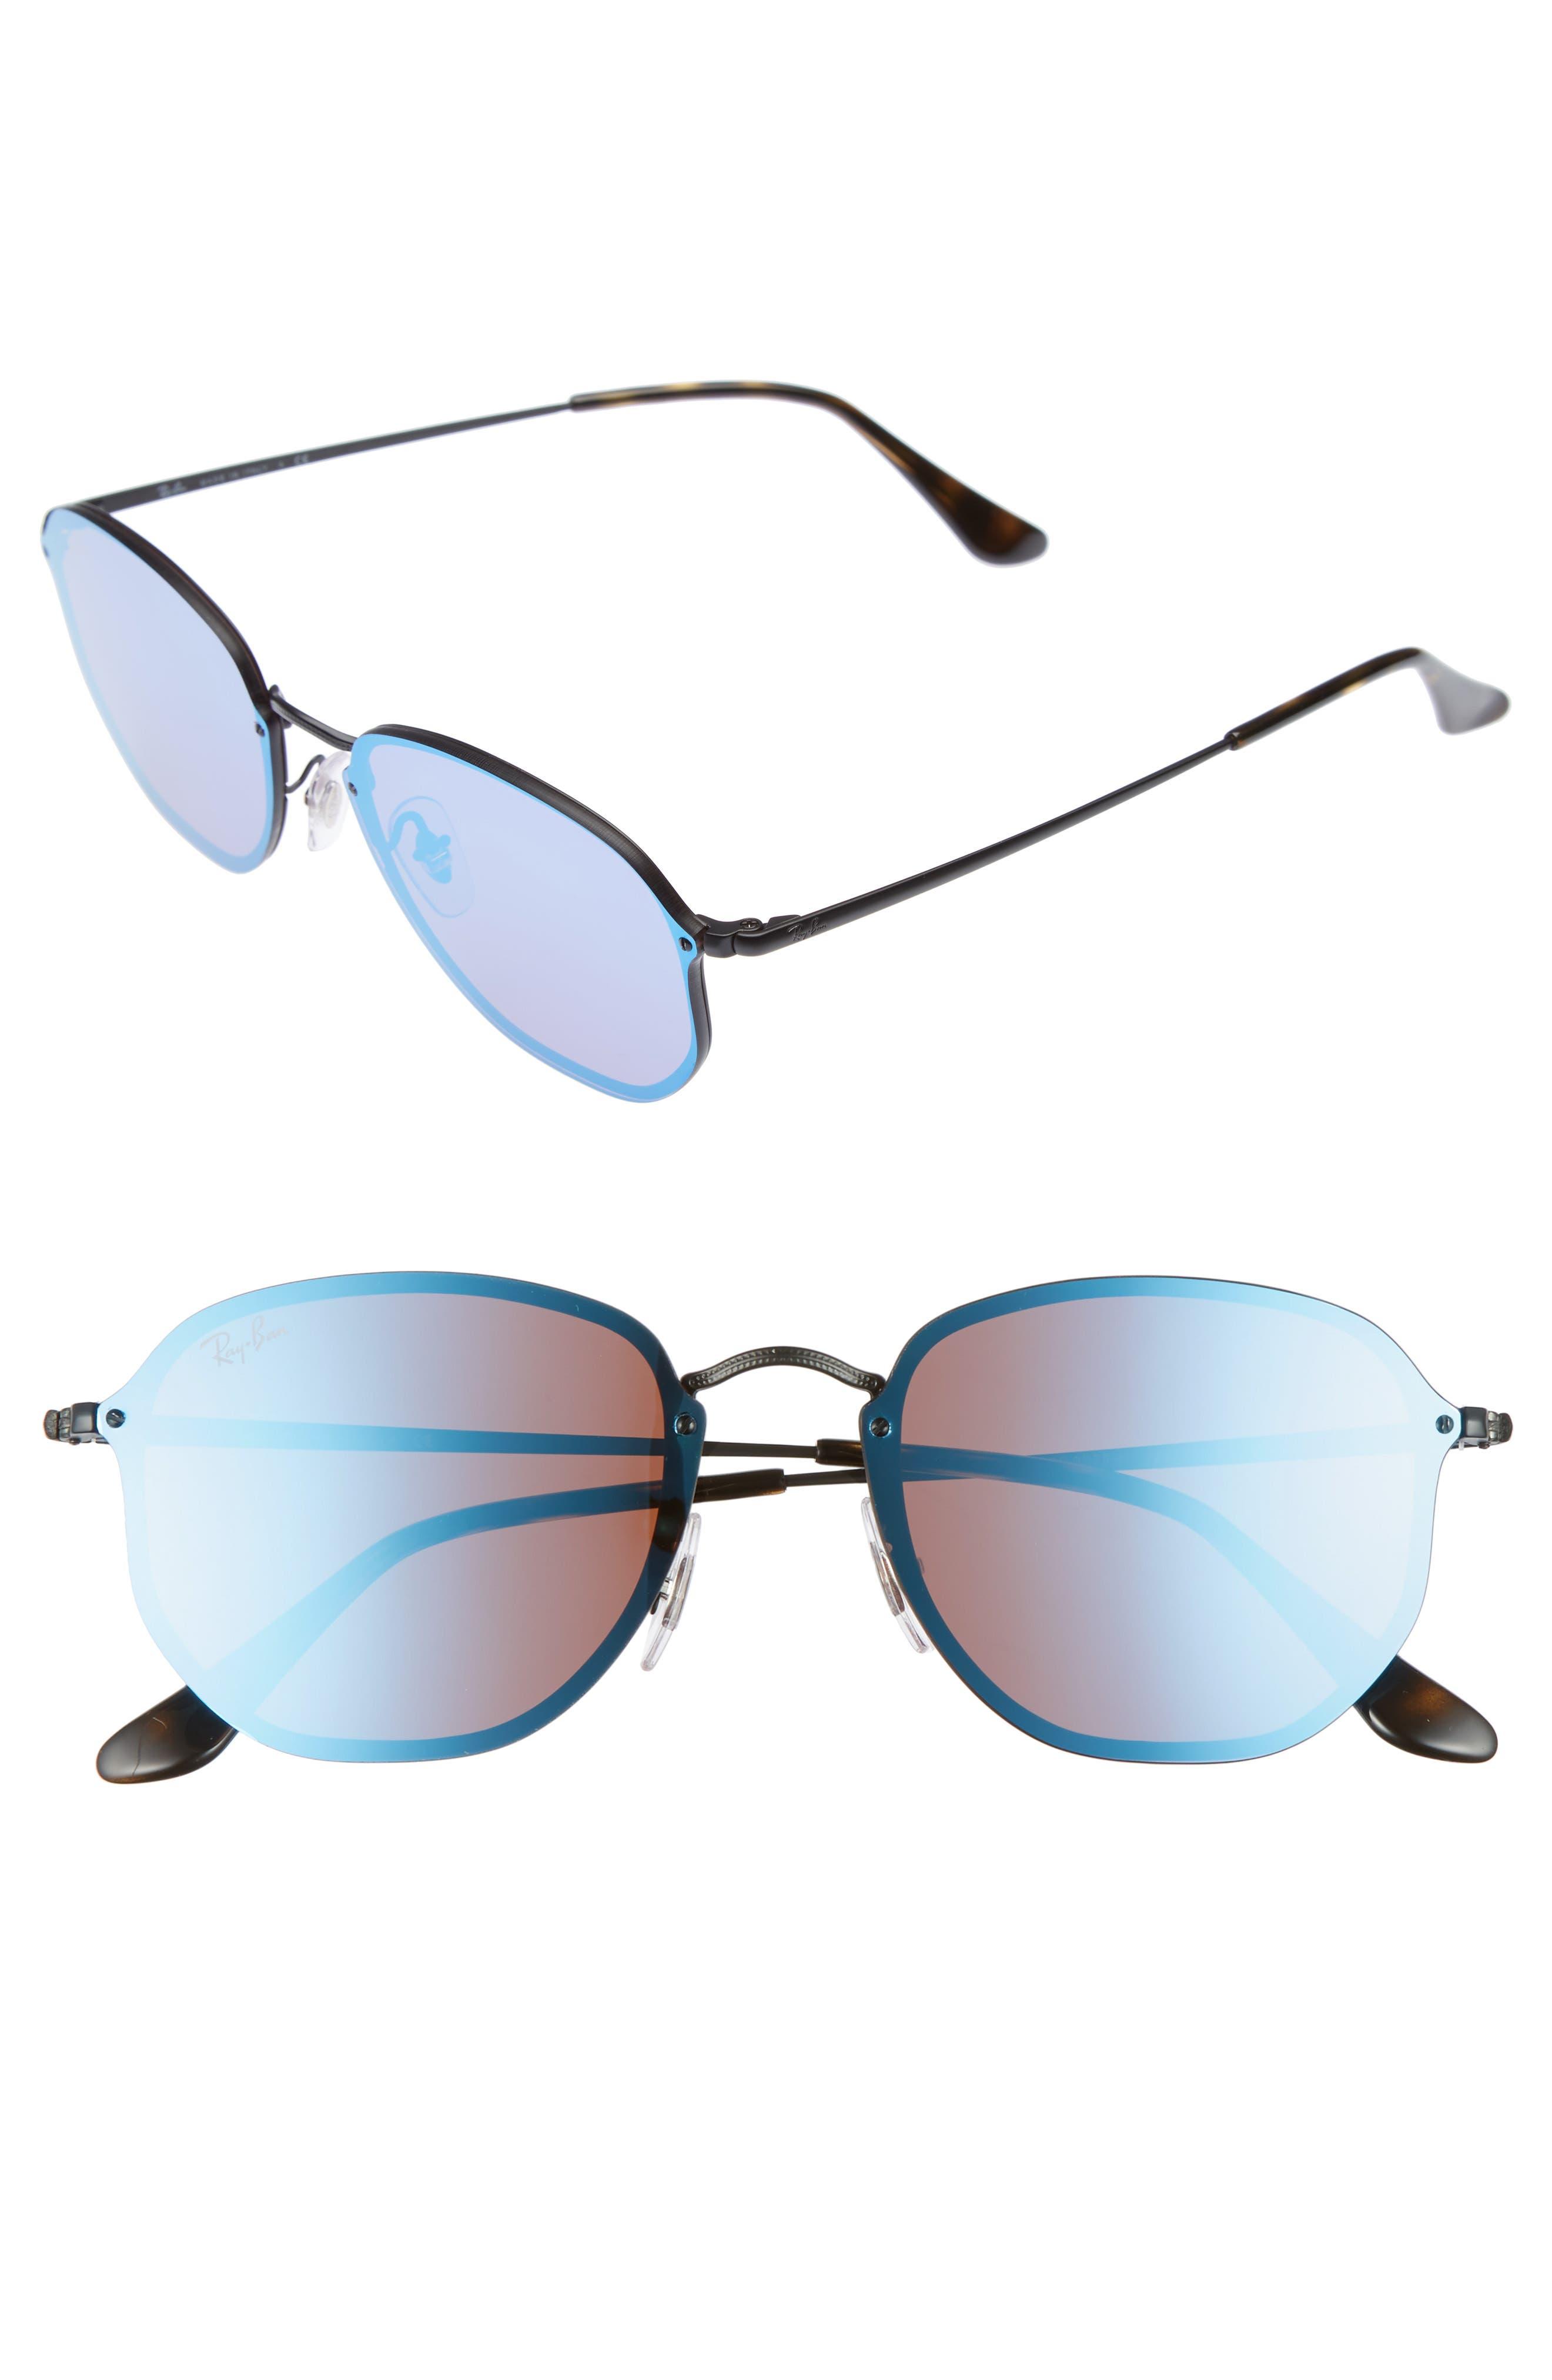 58mm Round Sunglasses,                         Main,                         color,